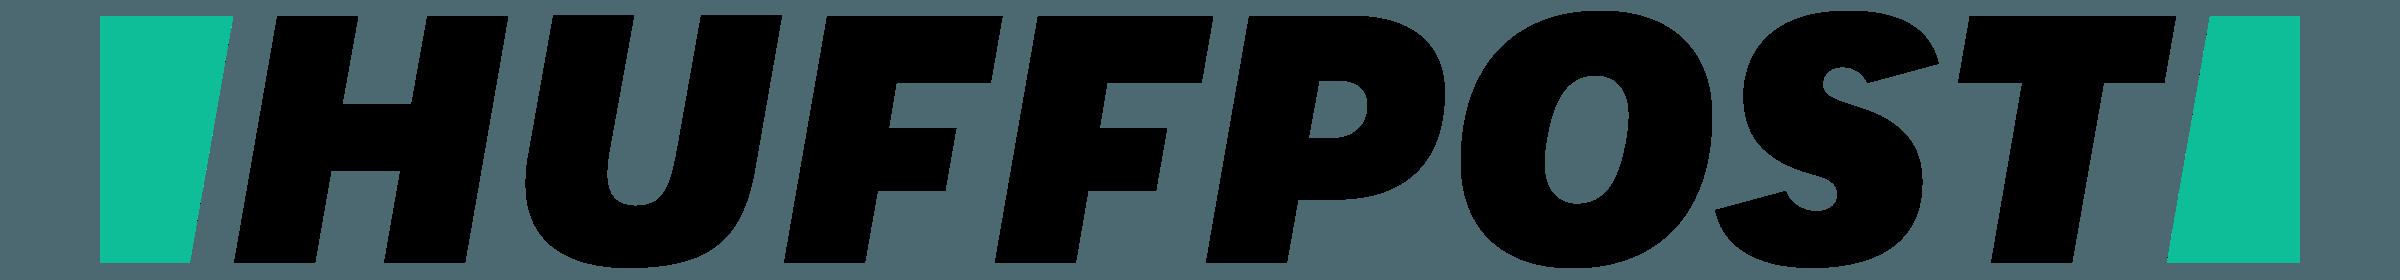 huffpost logo png transparent amp svg vector freebie supply